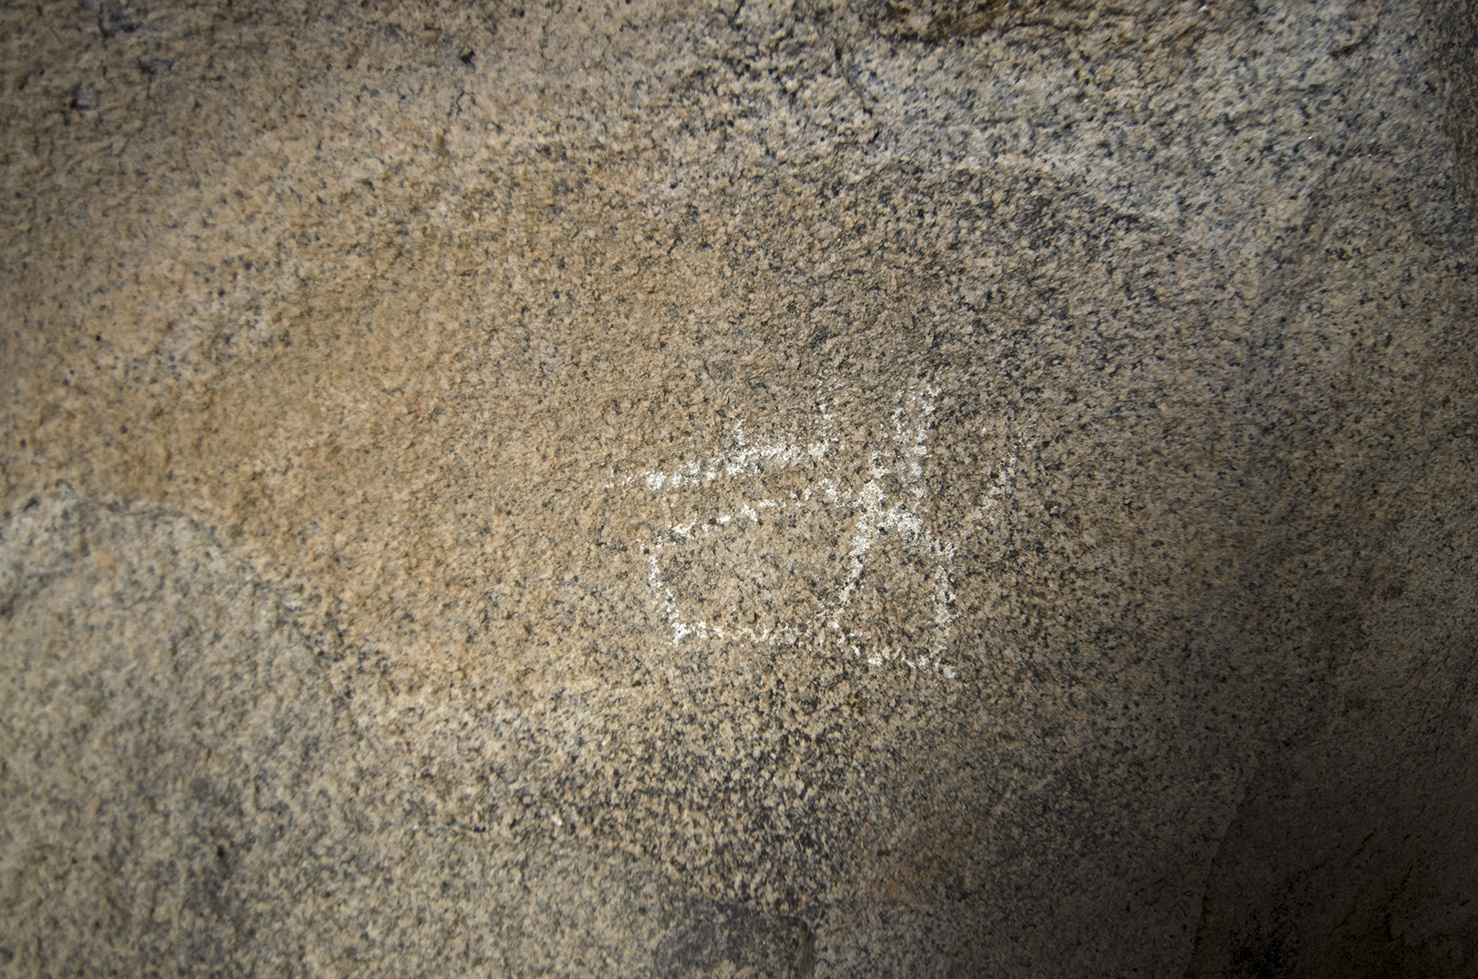 The lone petroglyph